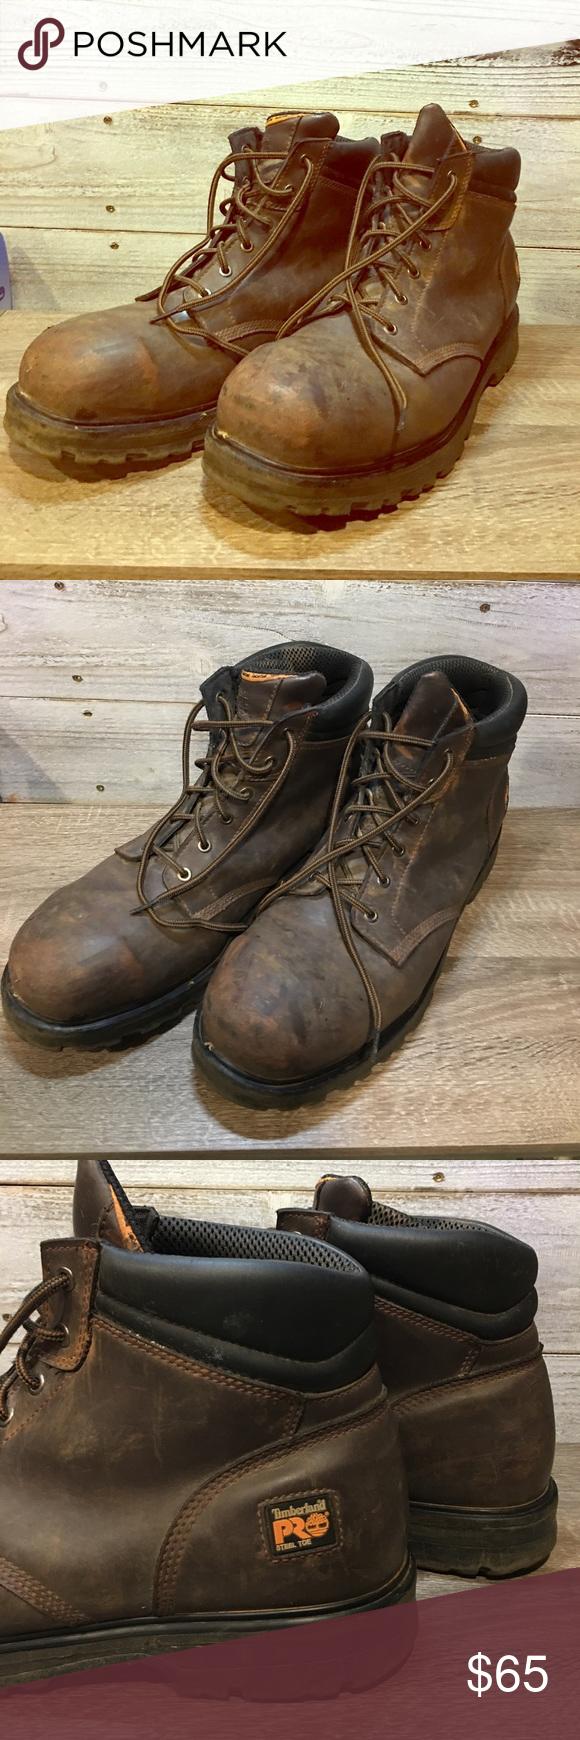 Timberland Pro Steel Toe Work Boots men